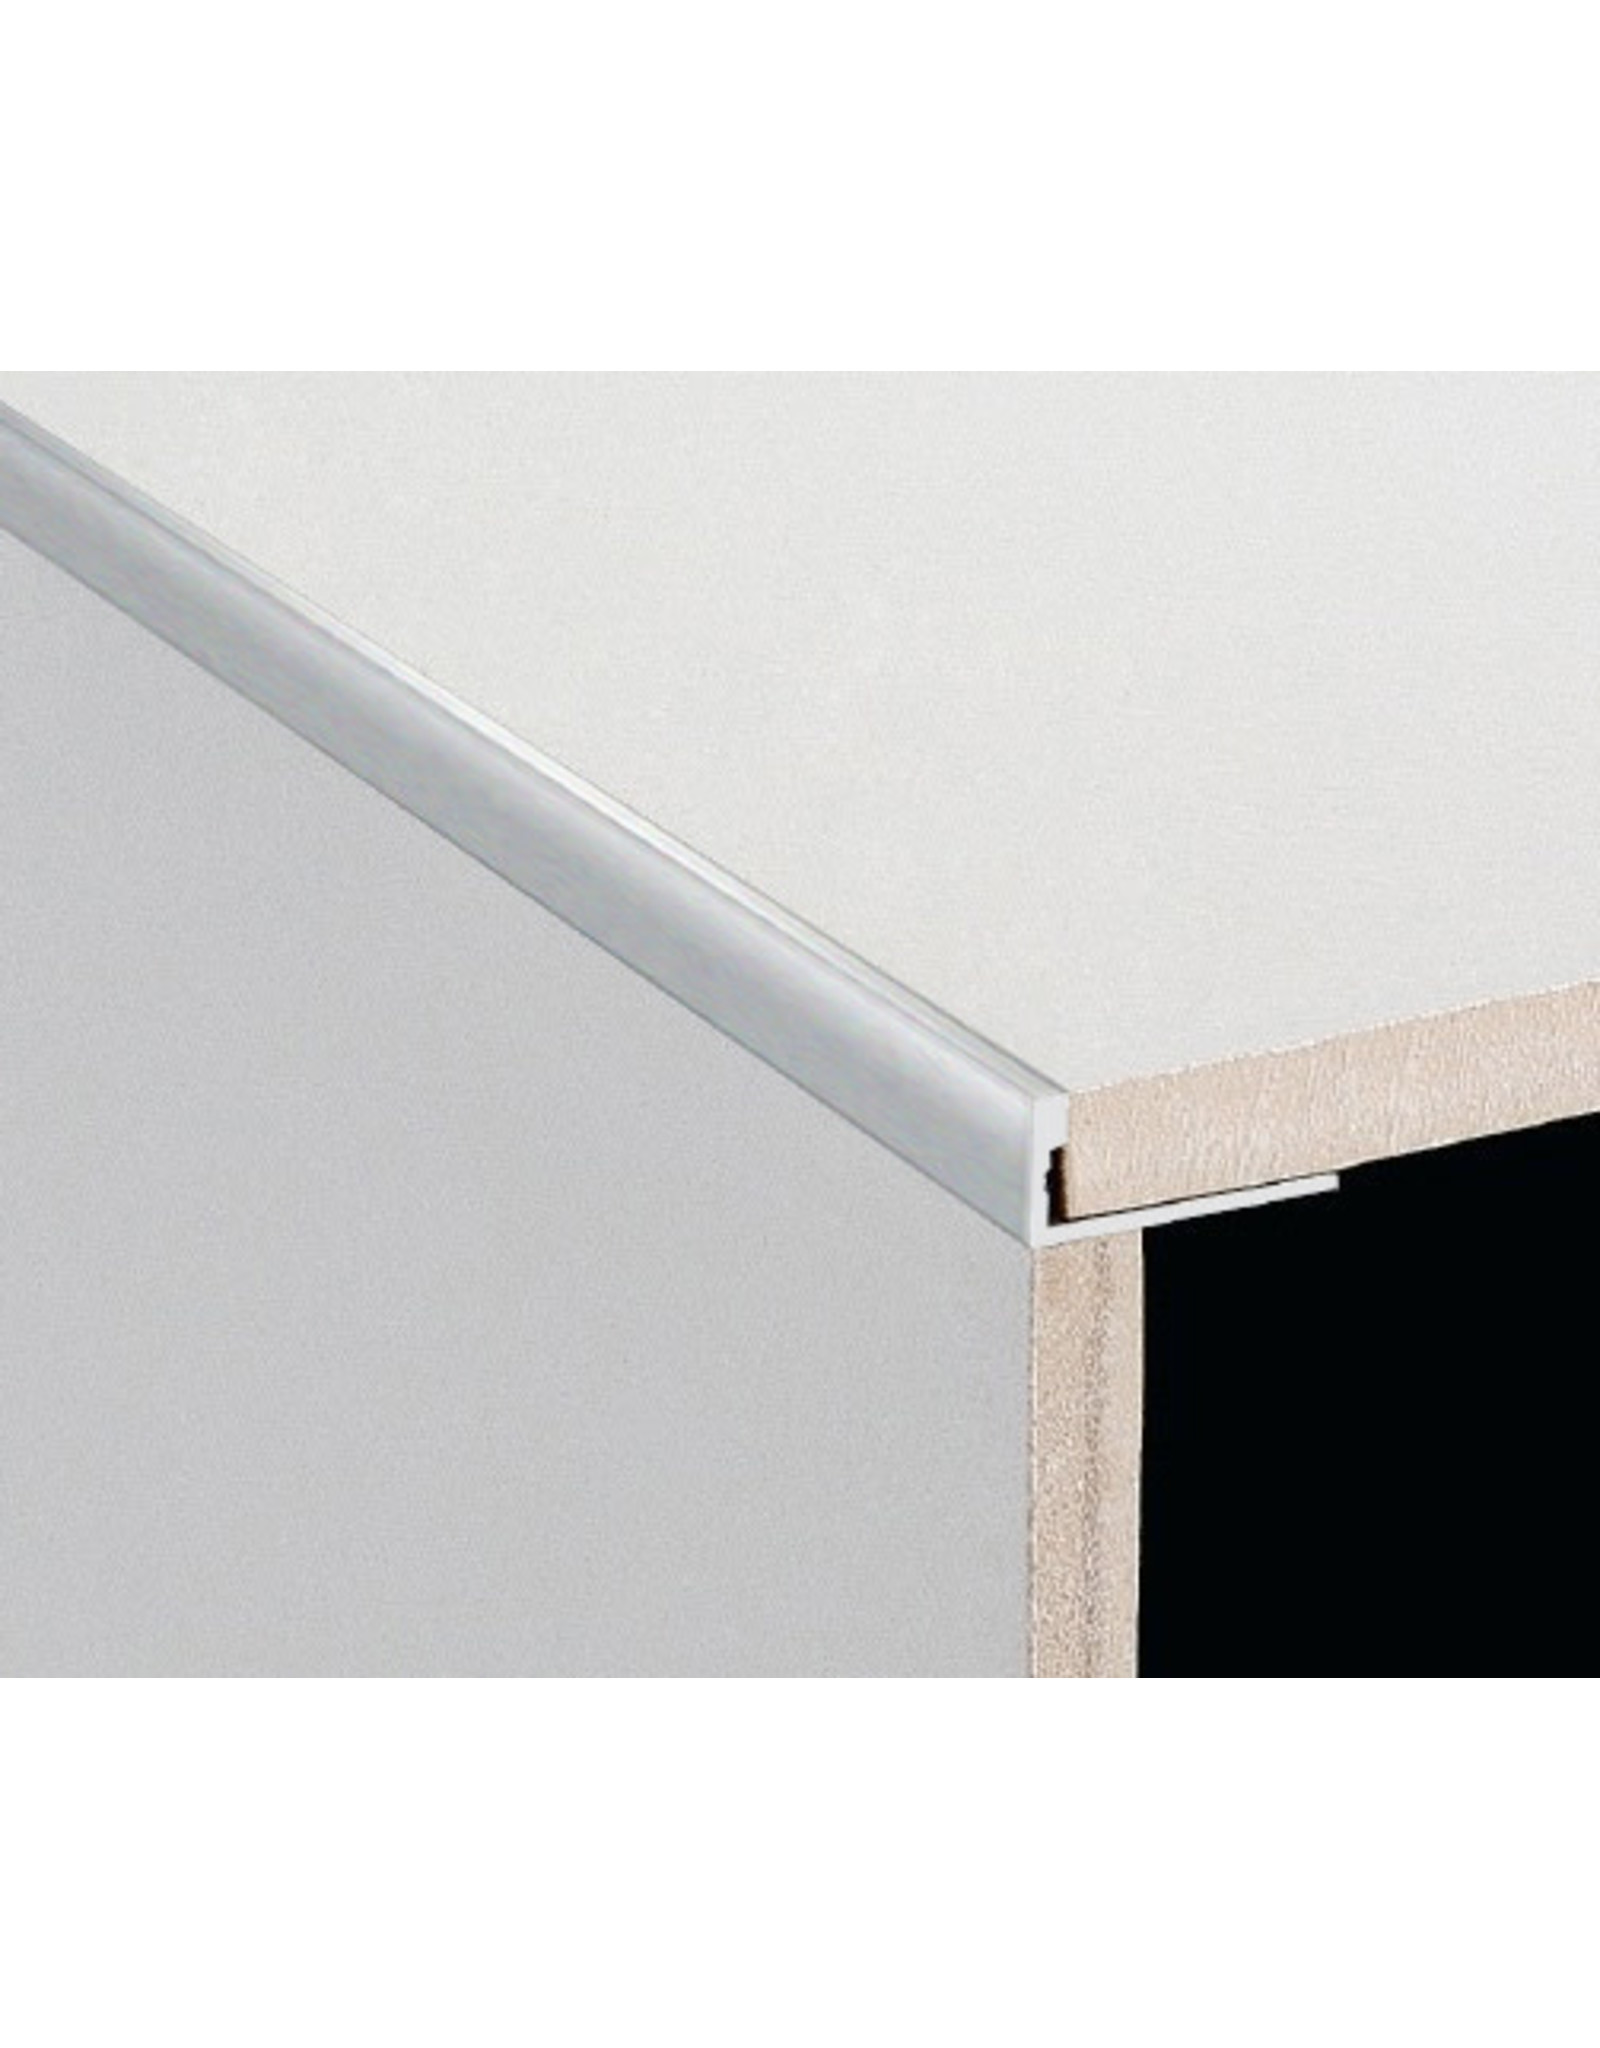 DTA 11mm DTA Aluminium L-Shape Trim Brushed Silver